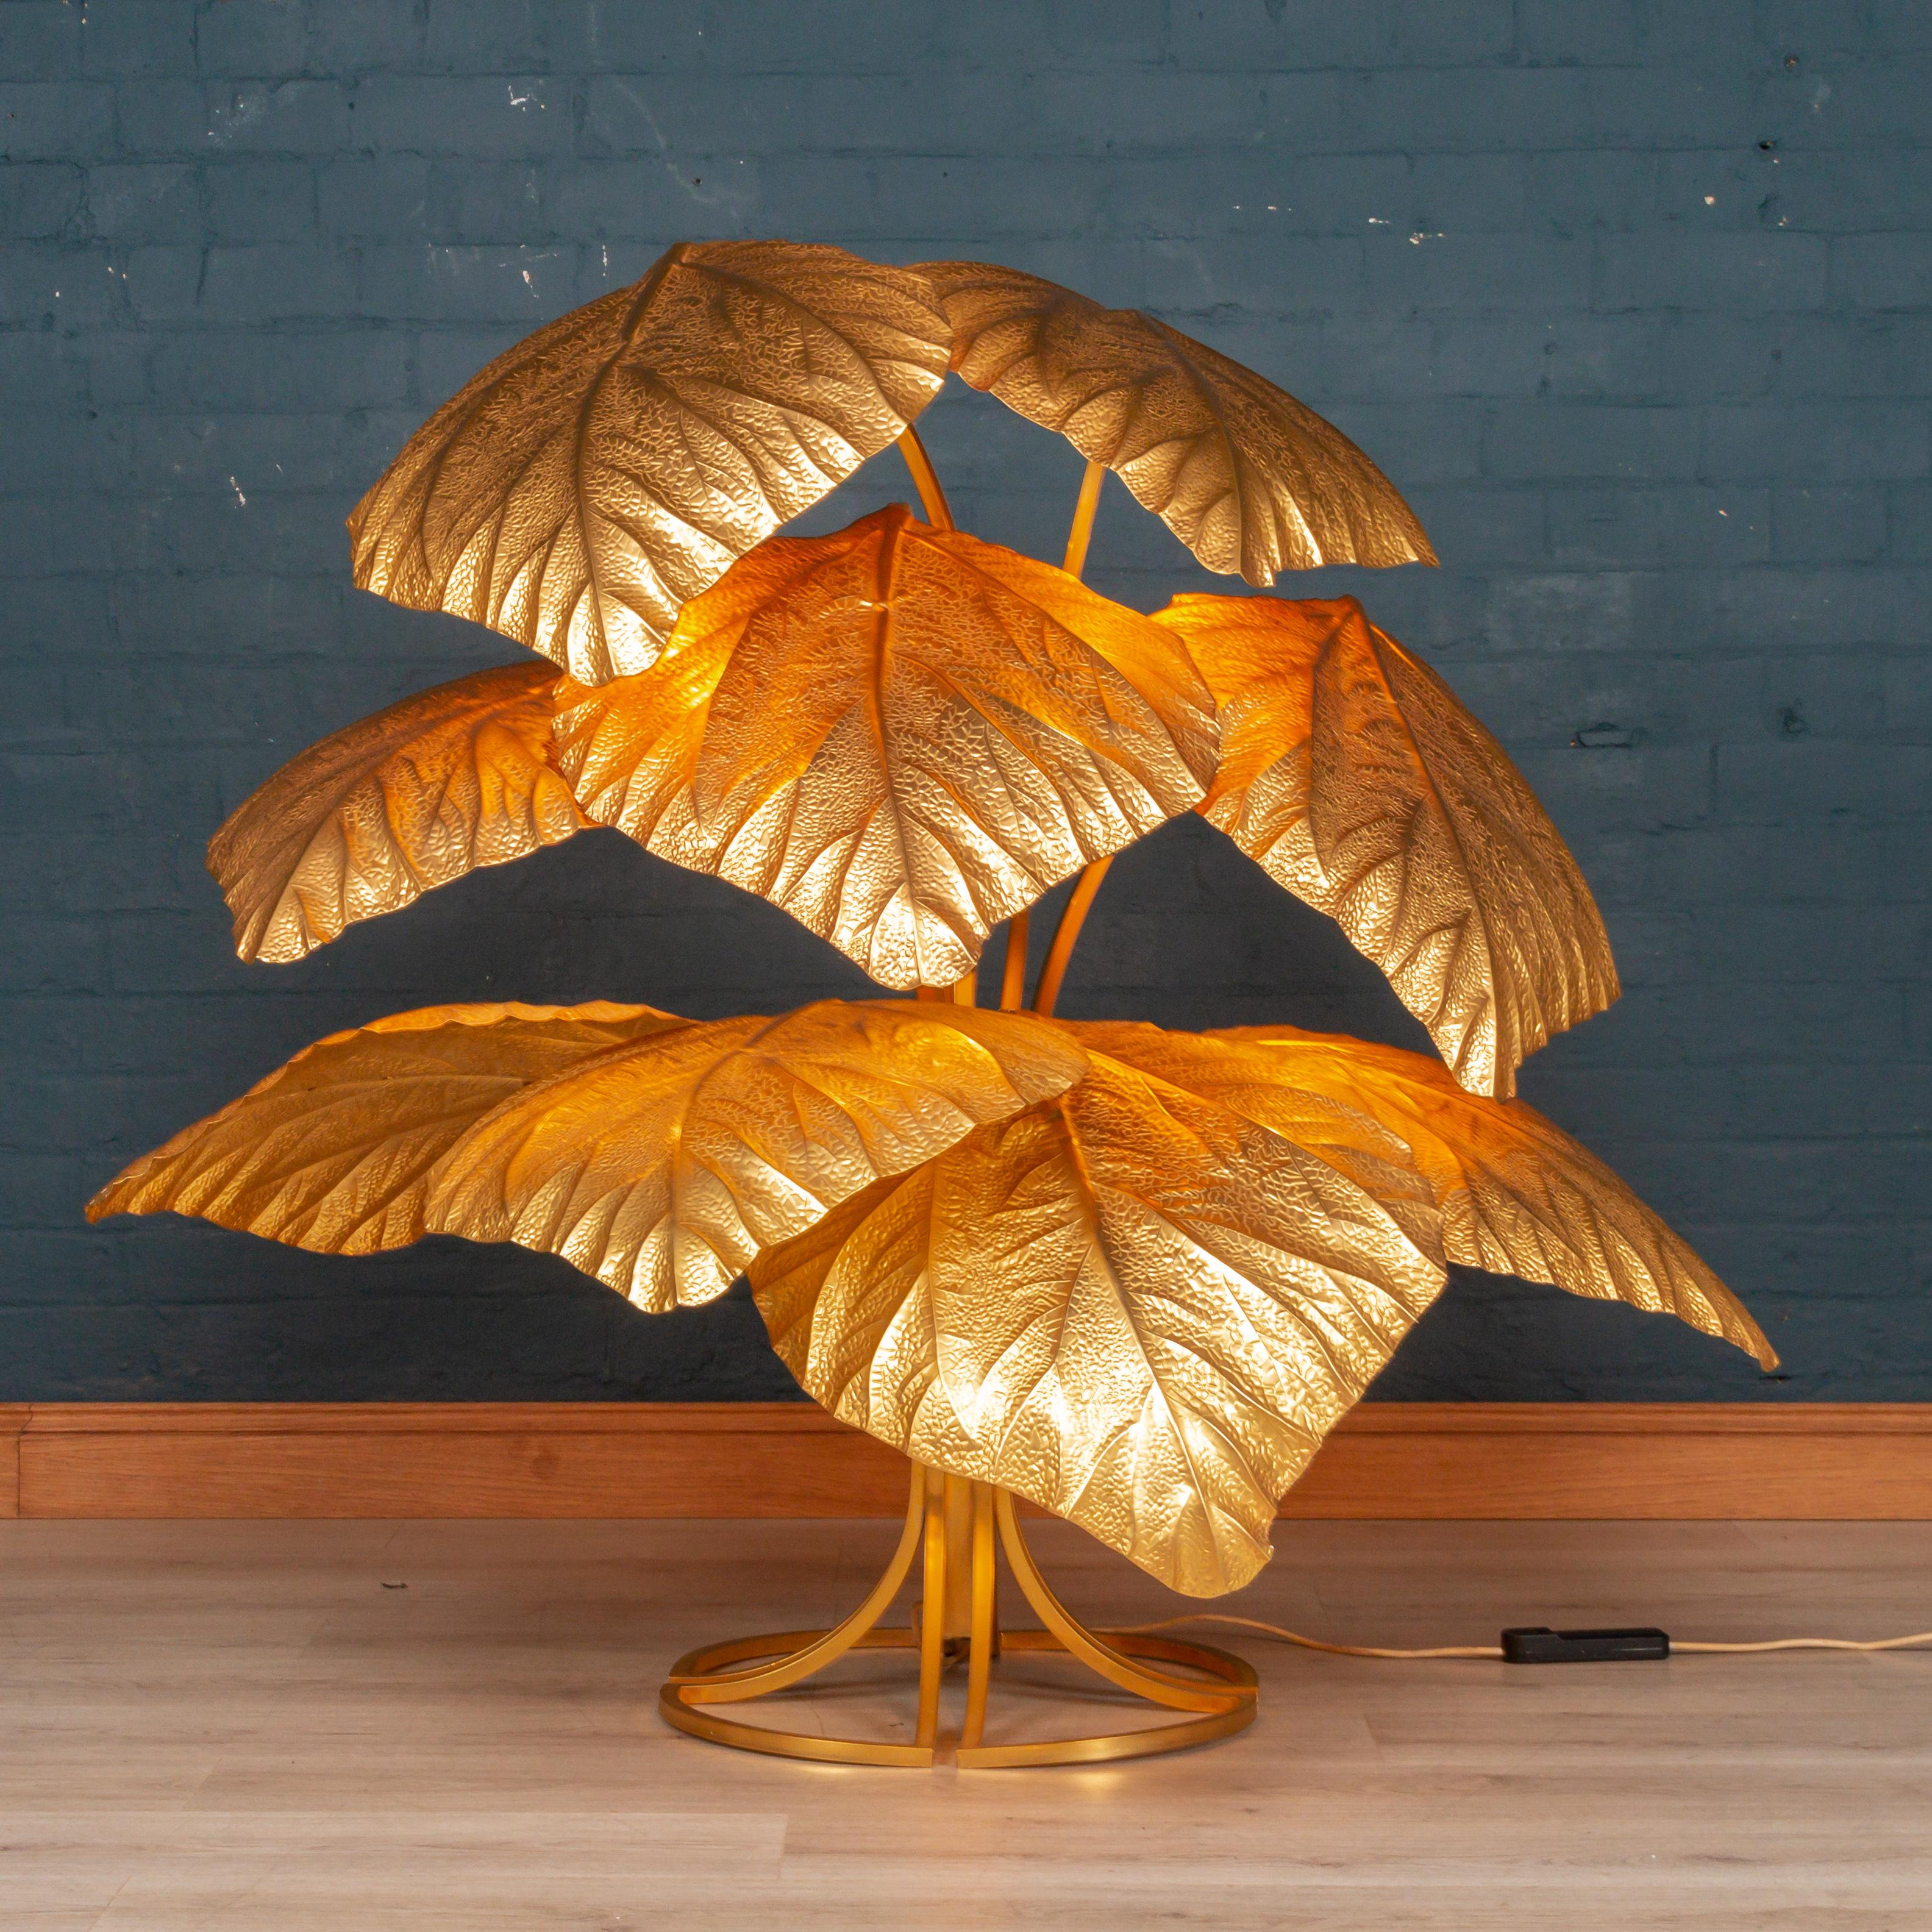 Lot 144 - Decorative/Interior Design: A nine leaf brass floor lamp by Tommaso Barbi, Italian, circa 1970